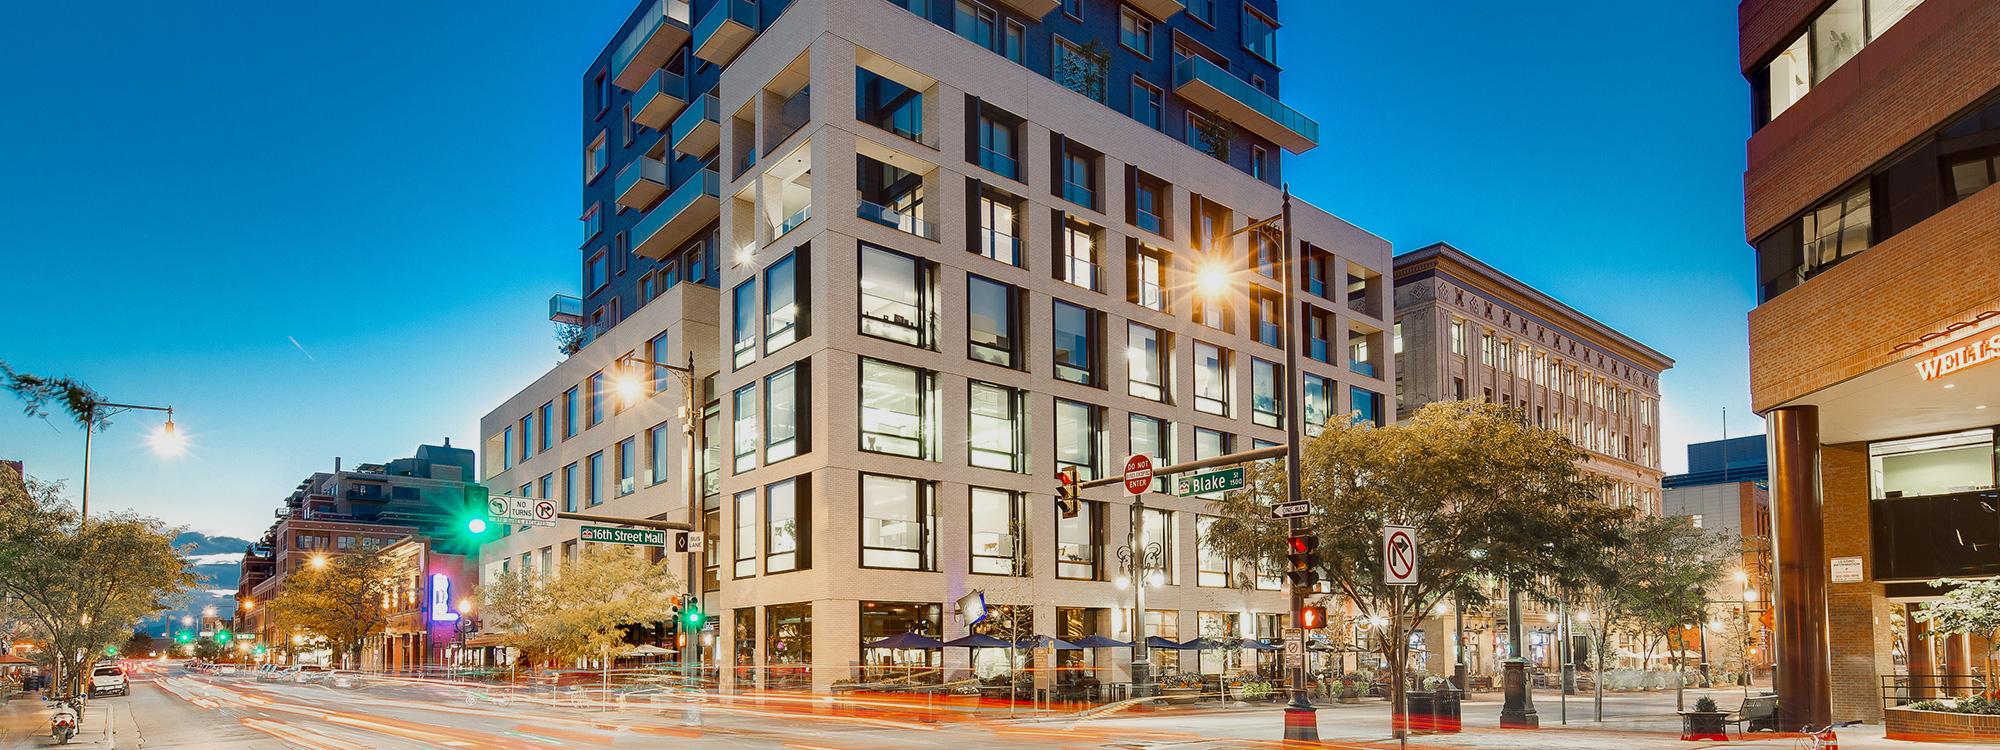 Blake Street Apartments